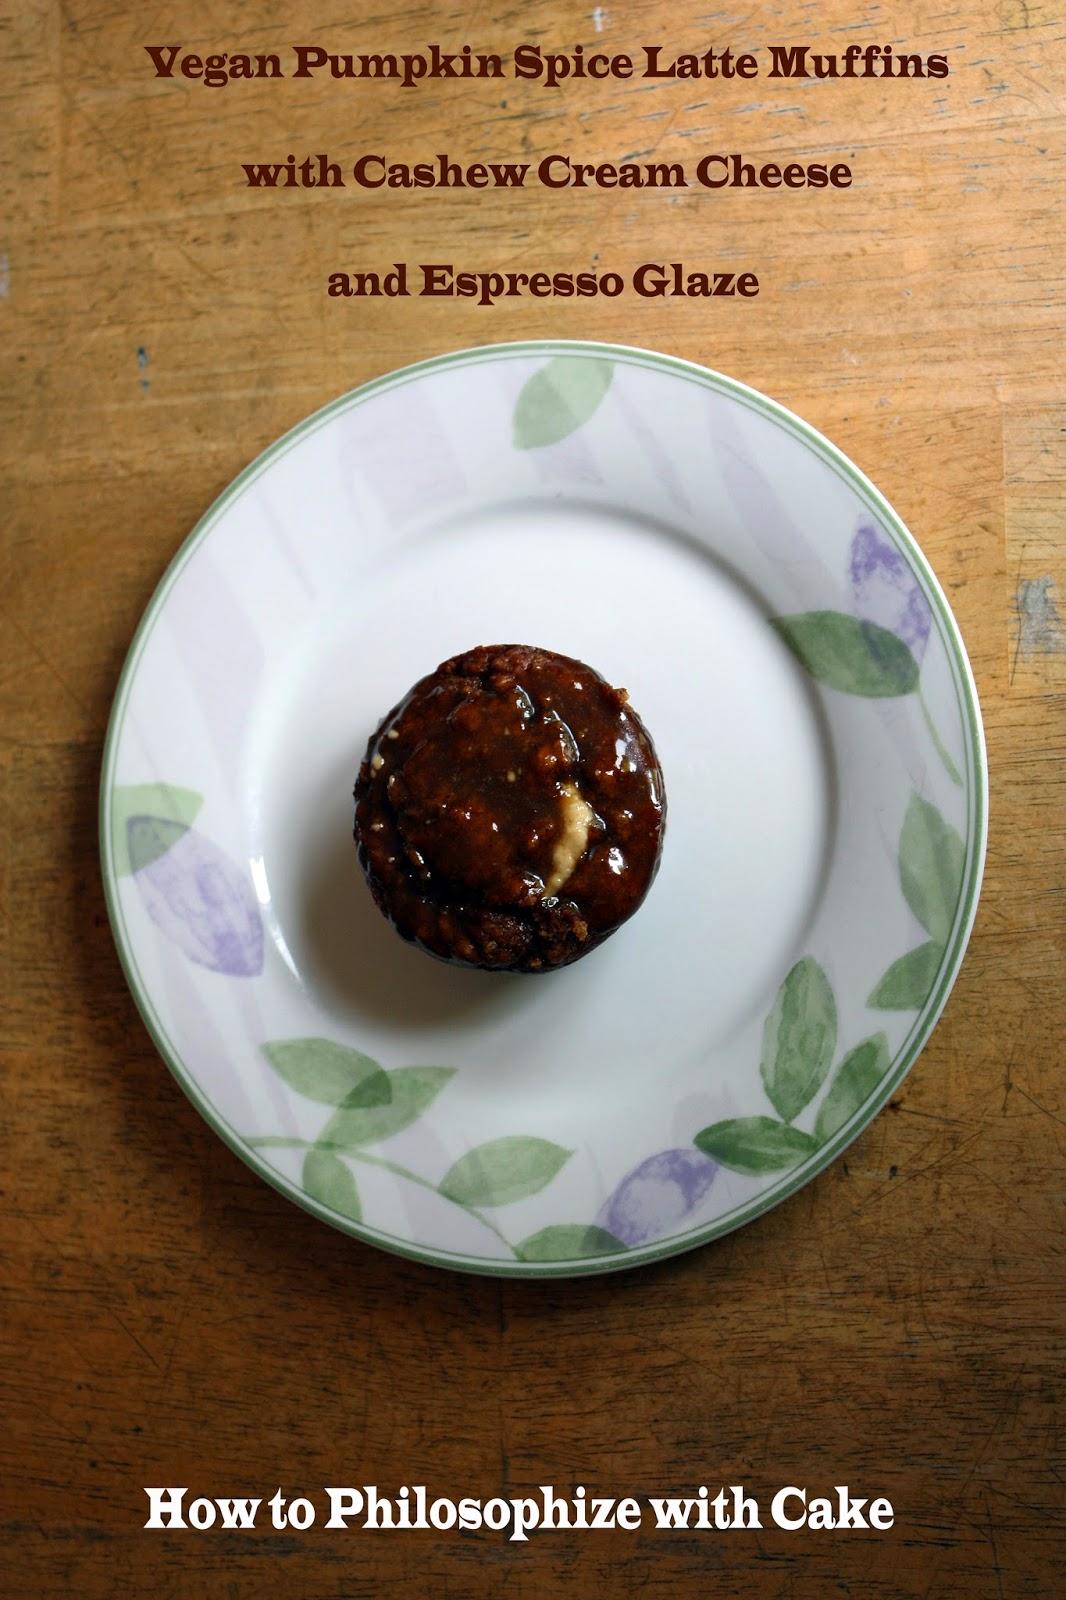 pumpkin spice latte muffins with espresso glaze